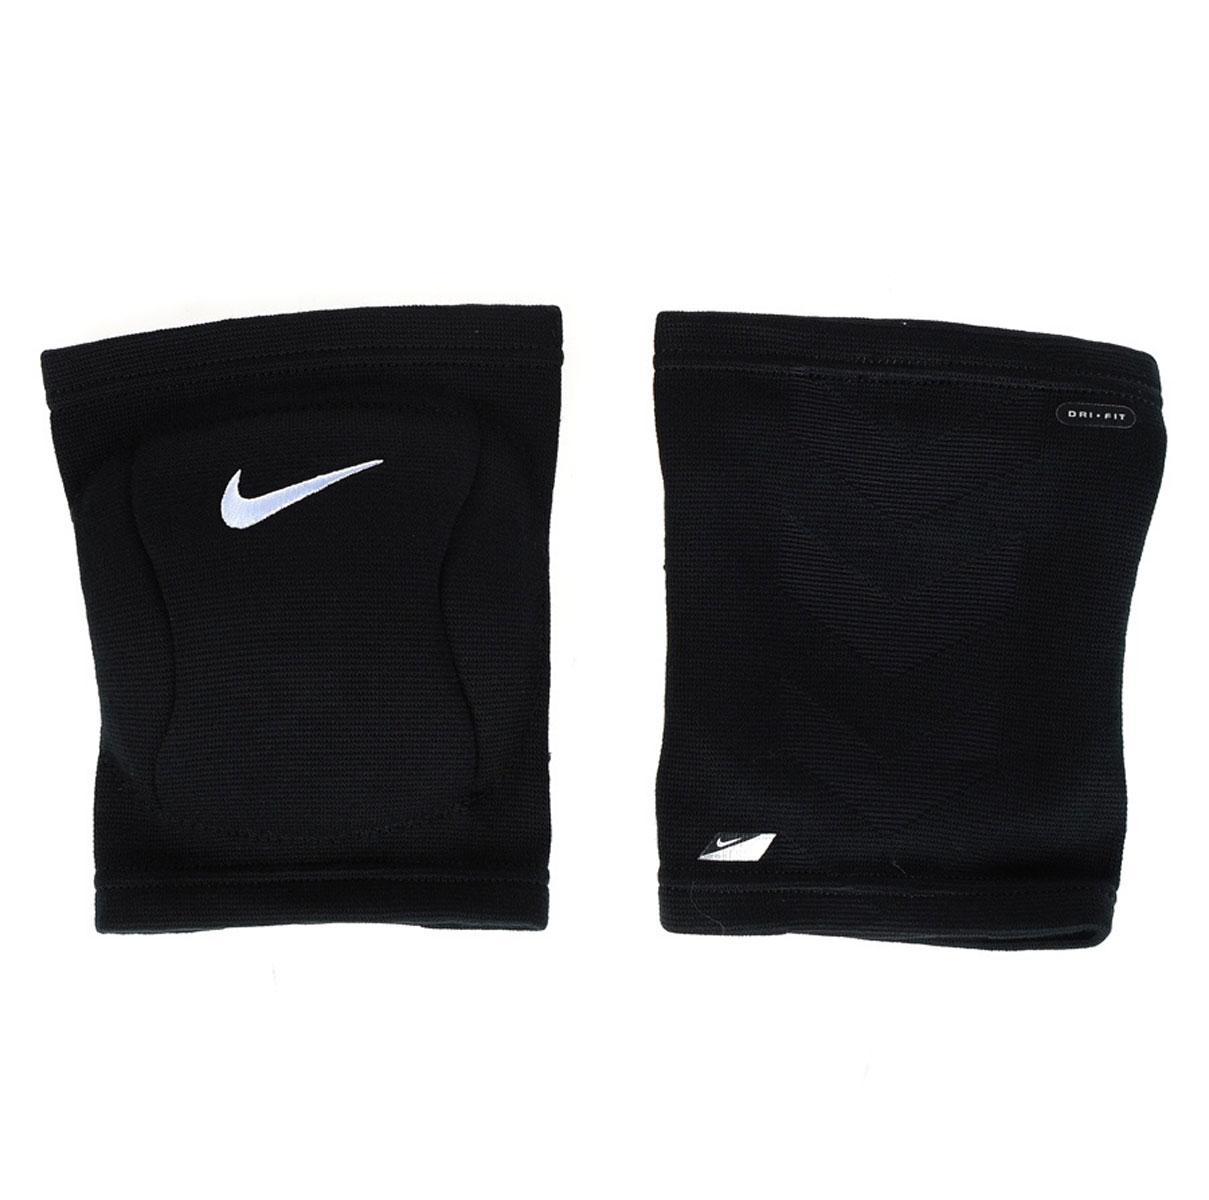 Наколенник Nike, цвет: черный. Размер L/XL наколенник nike цвет белый размер l xl